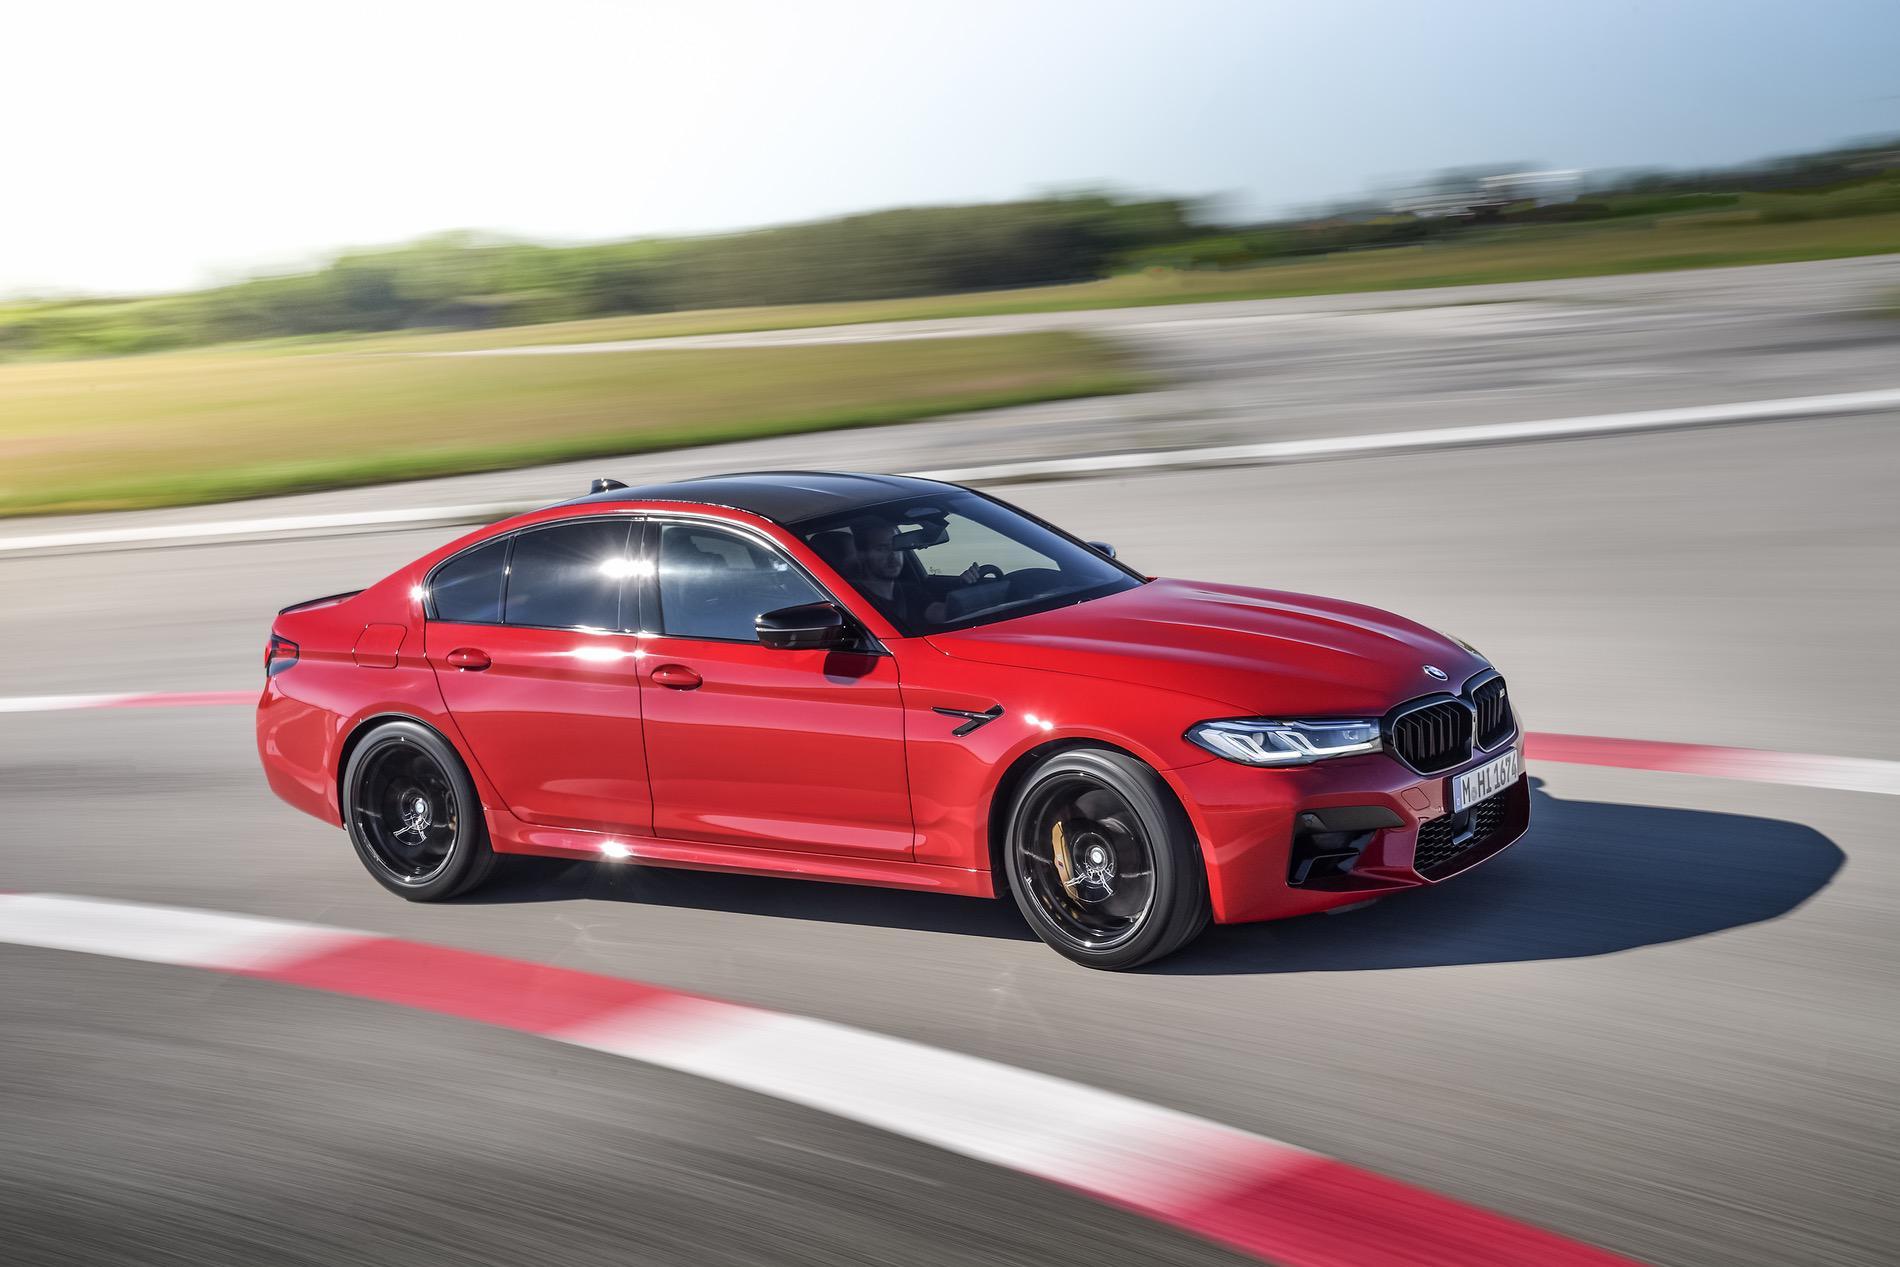 2021 BMW M5 ขุมพลังเดิม เพิ่มเติมเทคโนโลยีล้ำสมัยขึ้น